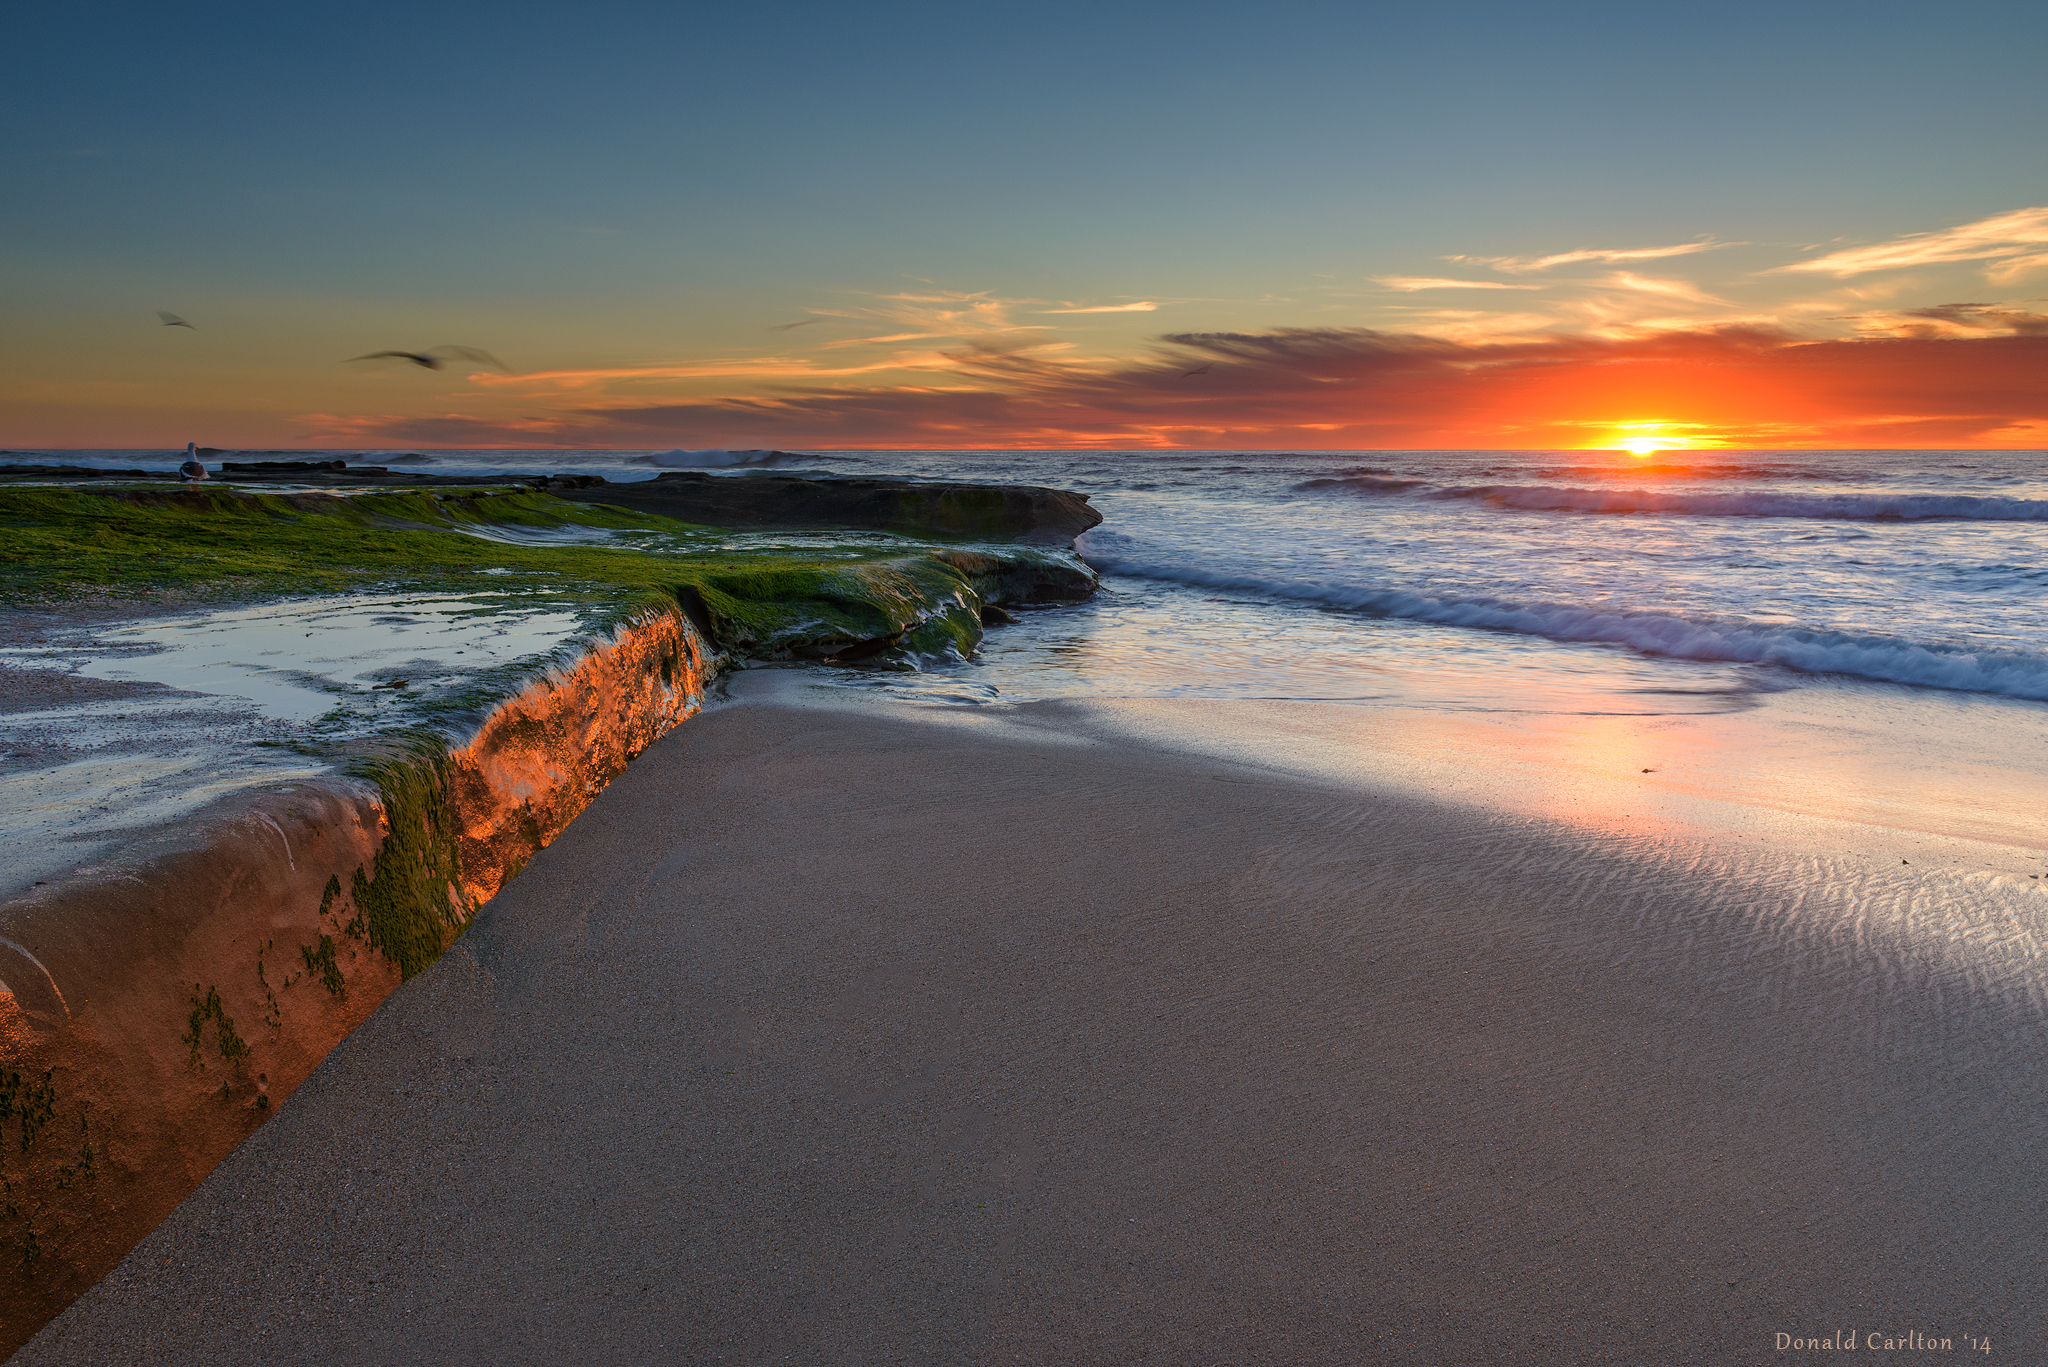 Donald_Carlton_Landscape-010.jpg